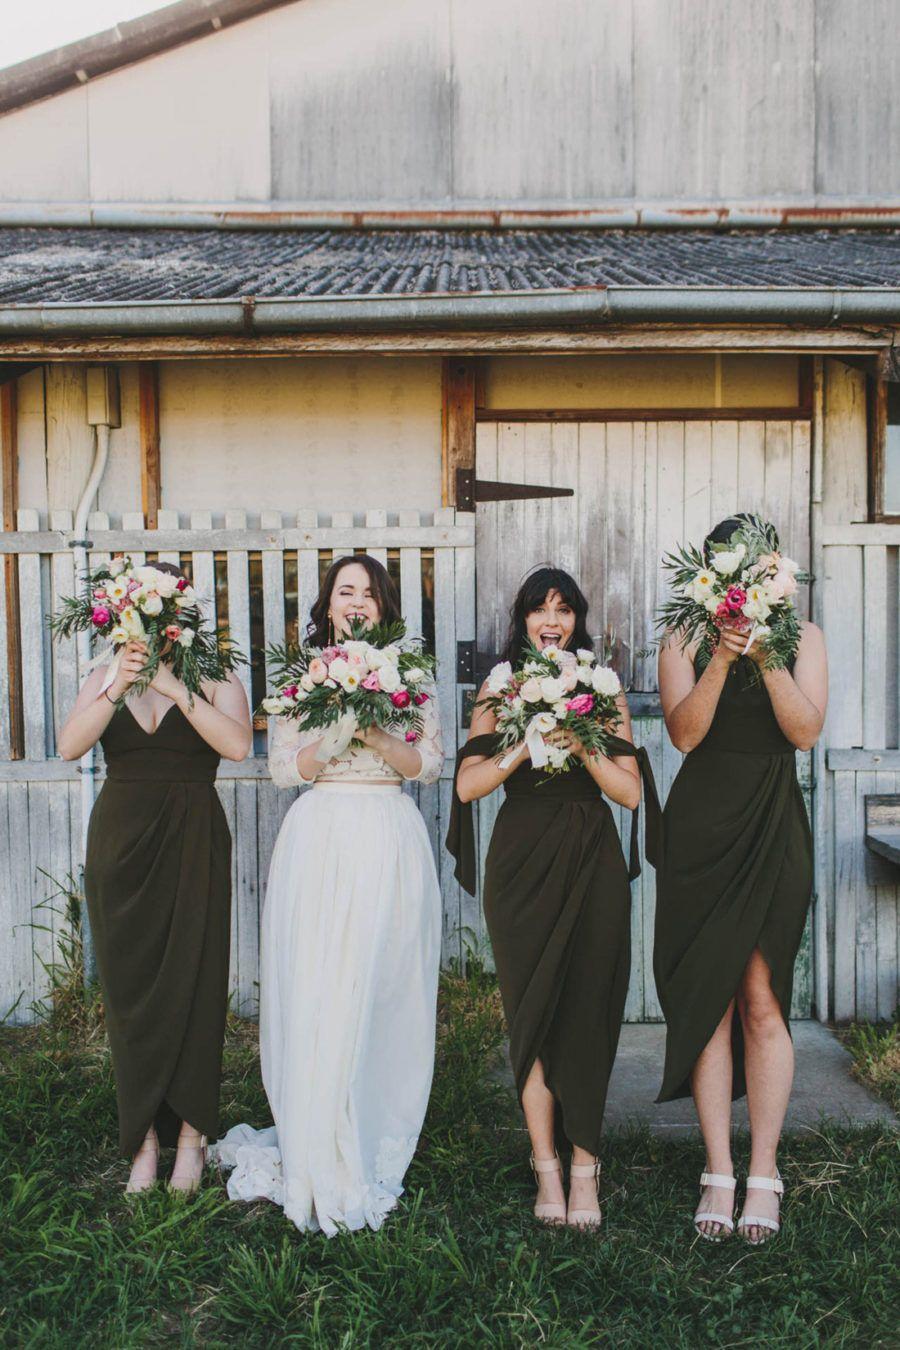 Soraya Blake S Bohemian Backyard Wedding Nouba Com Au Fall Bridesmaid Dresses Wedding Bridesmaid Dresses Green Bridesmaid Dresses